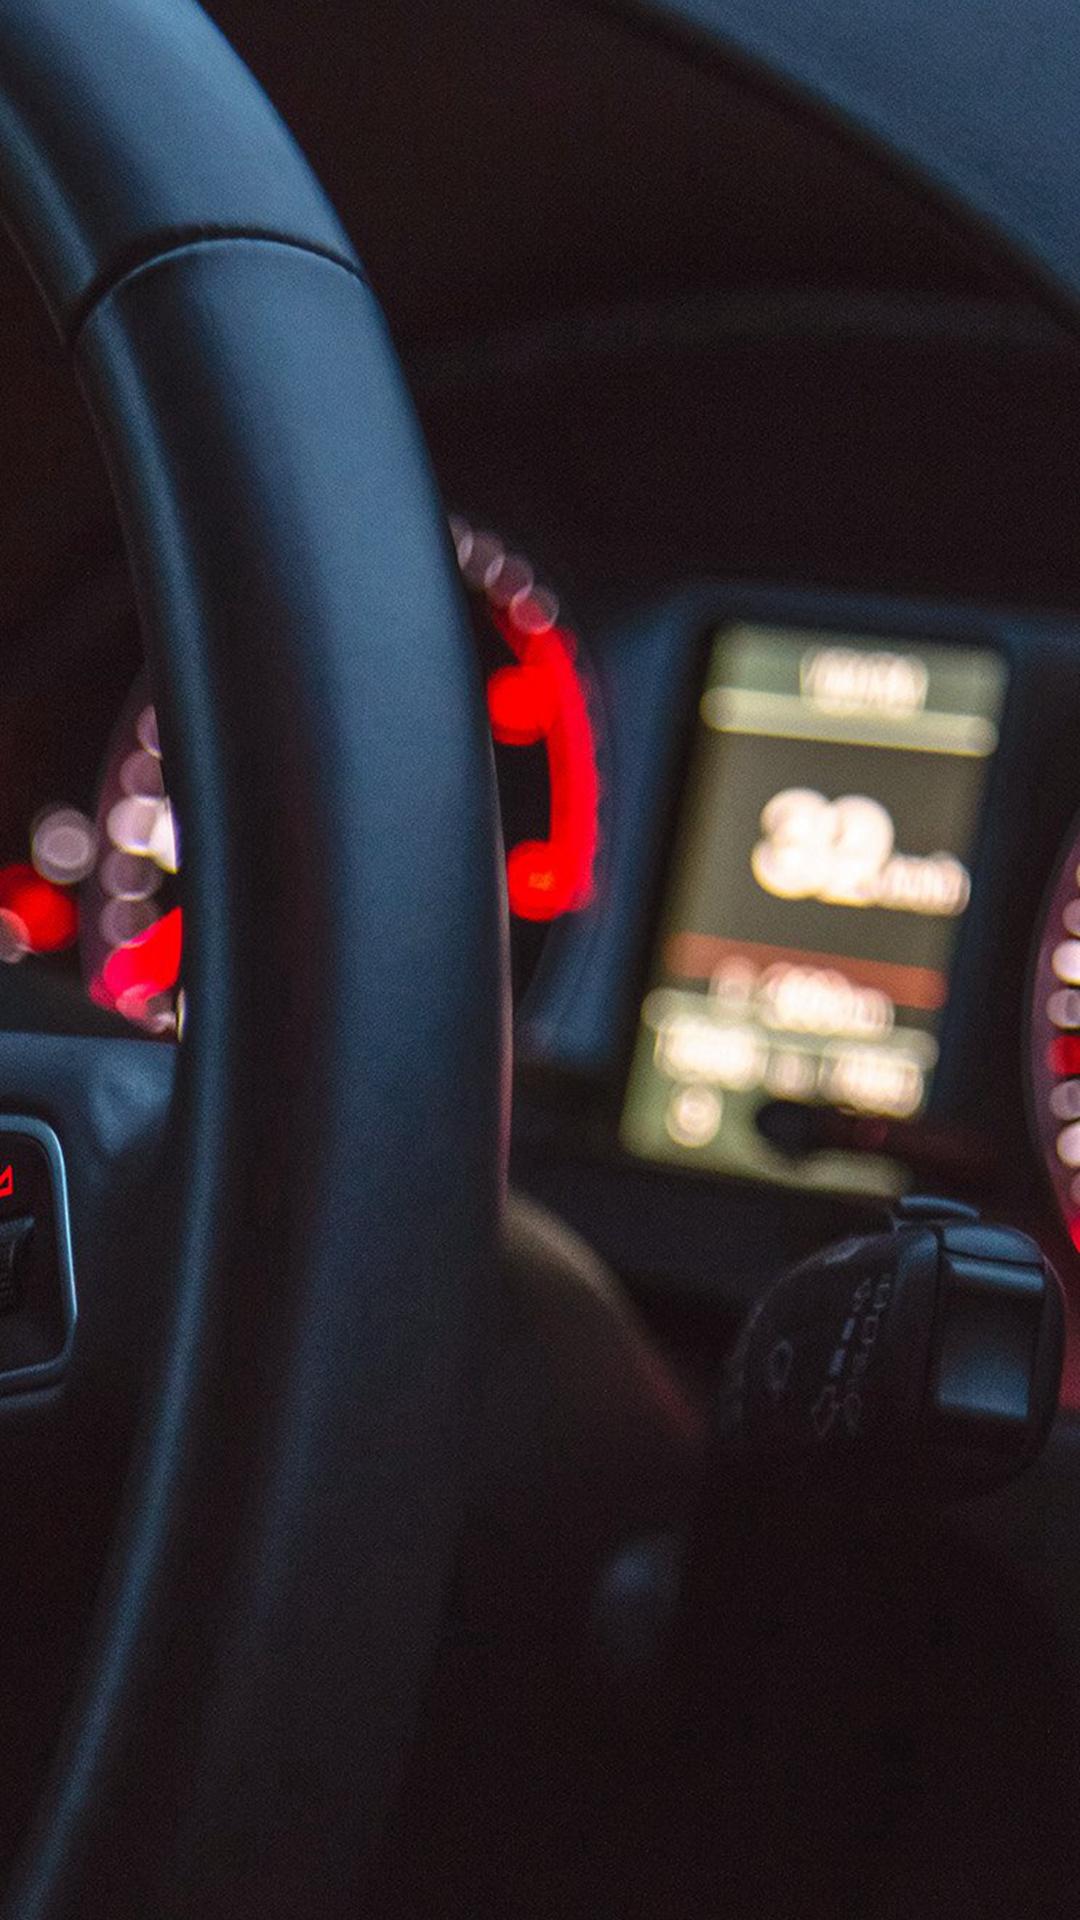 Car-Audi-Drive-Interior-Motor-Man-iPhone-wallpaper-wp5005749